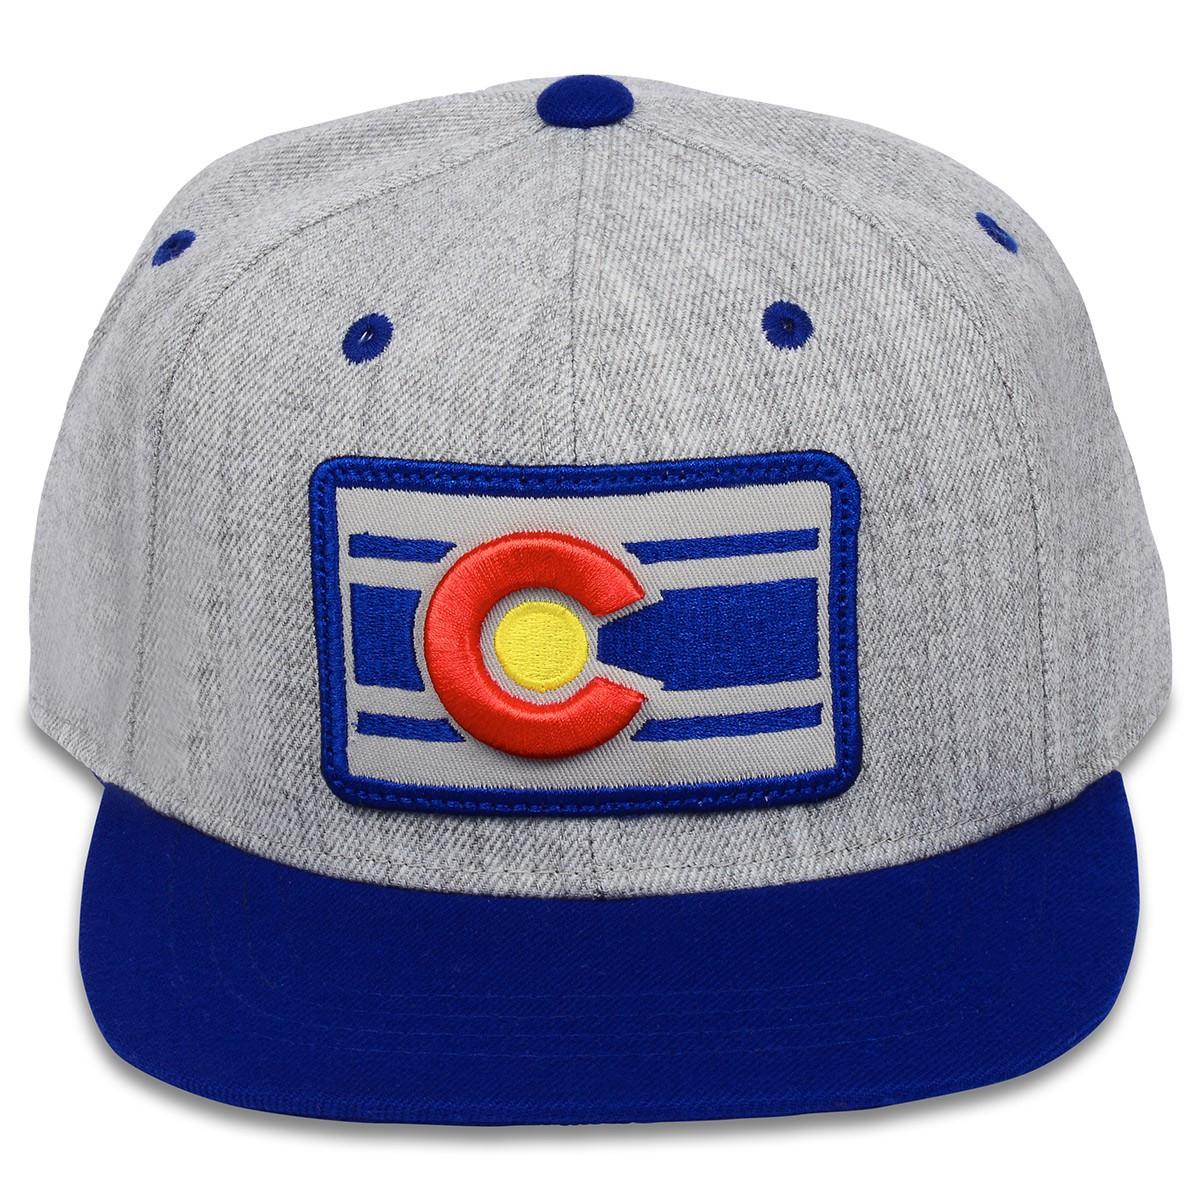 f378136b46c92 HEATHER CLASSIC SNAP BACK Blue - Breckenridge hat company